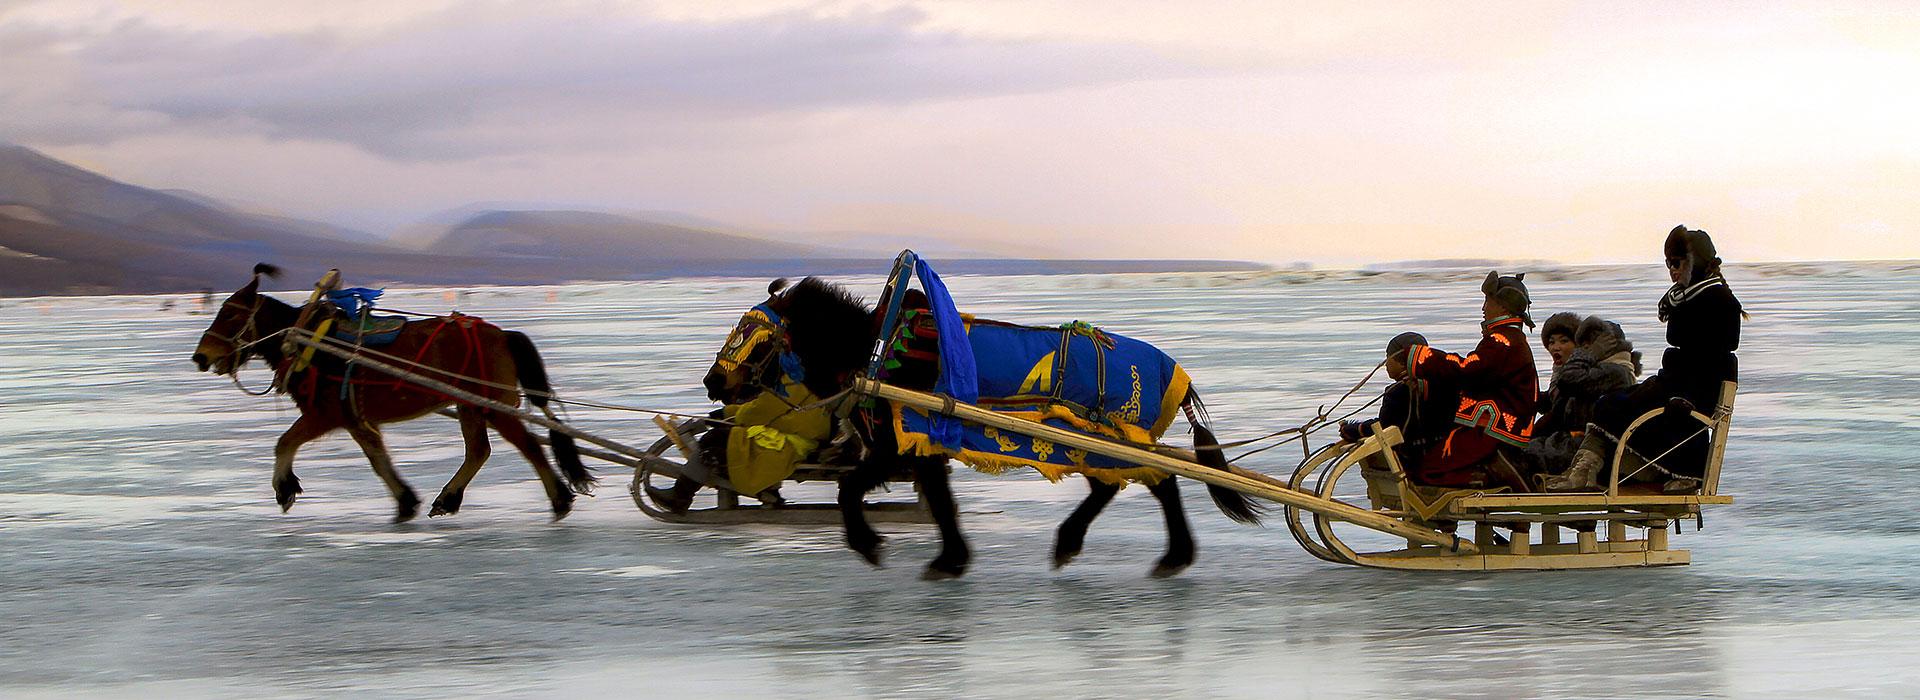 horse-sled-in-khuvsgul